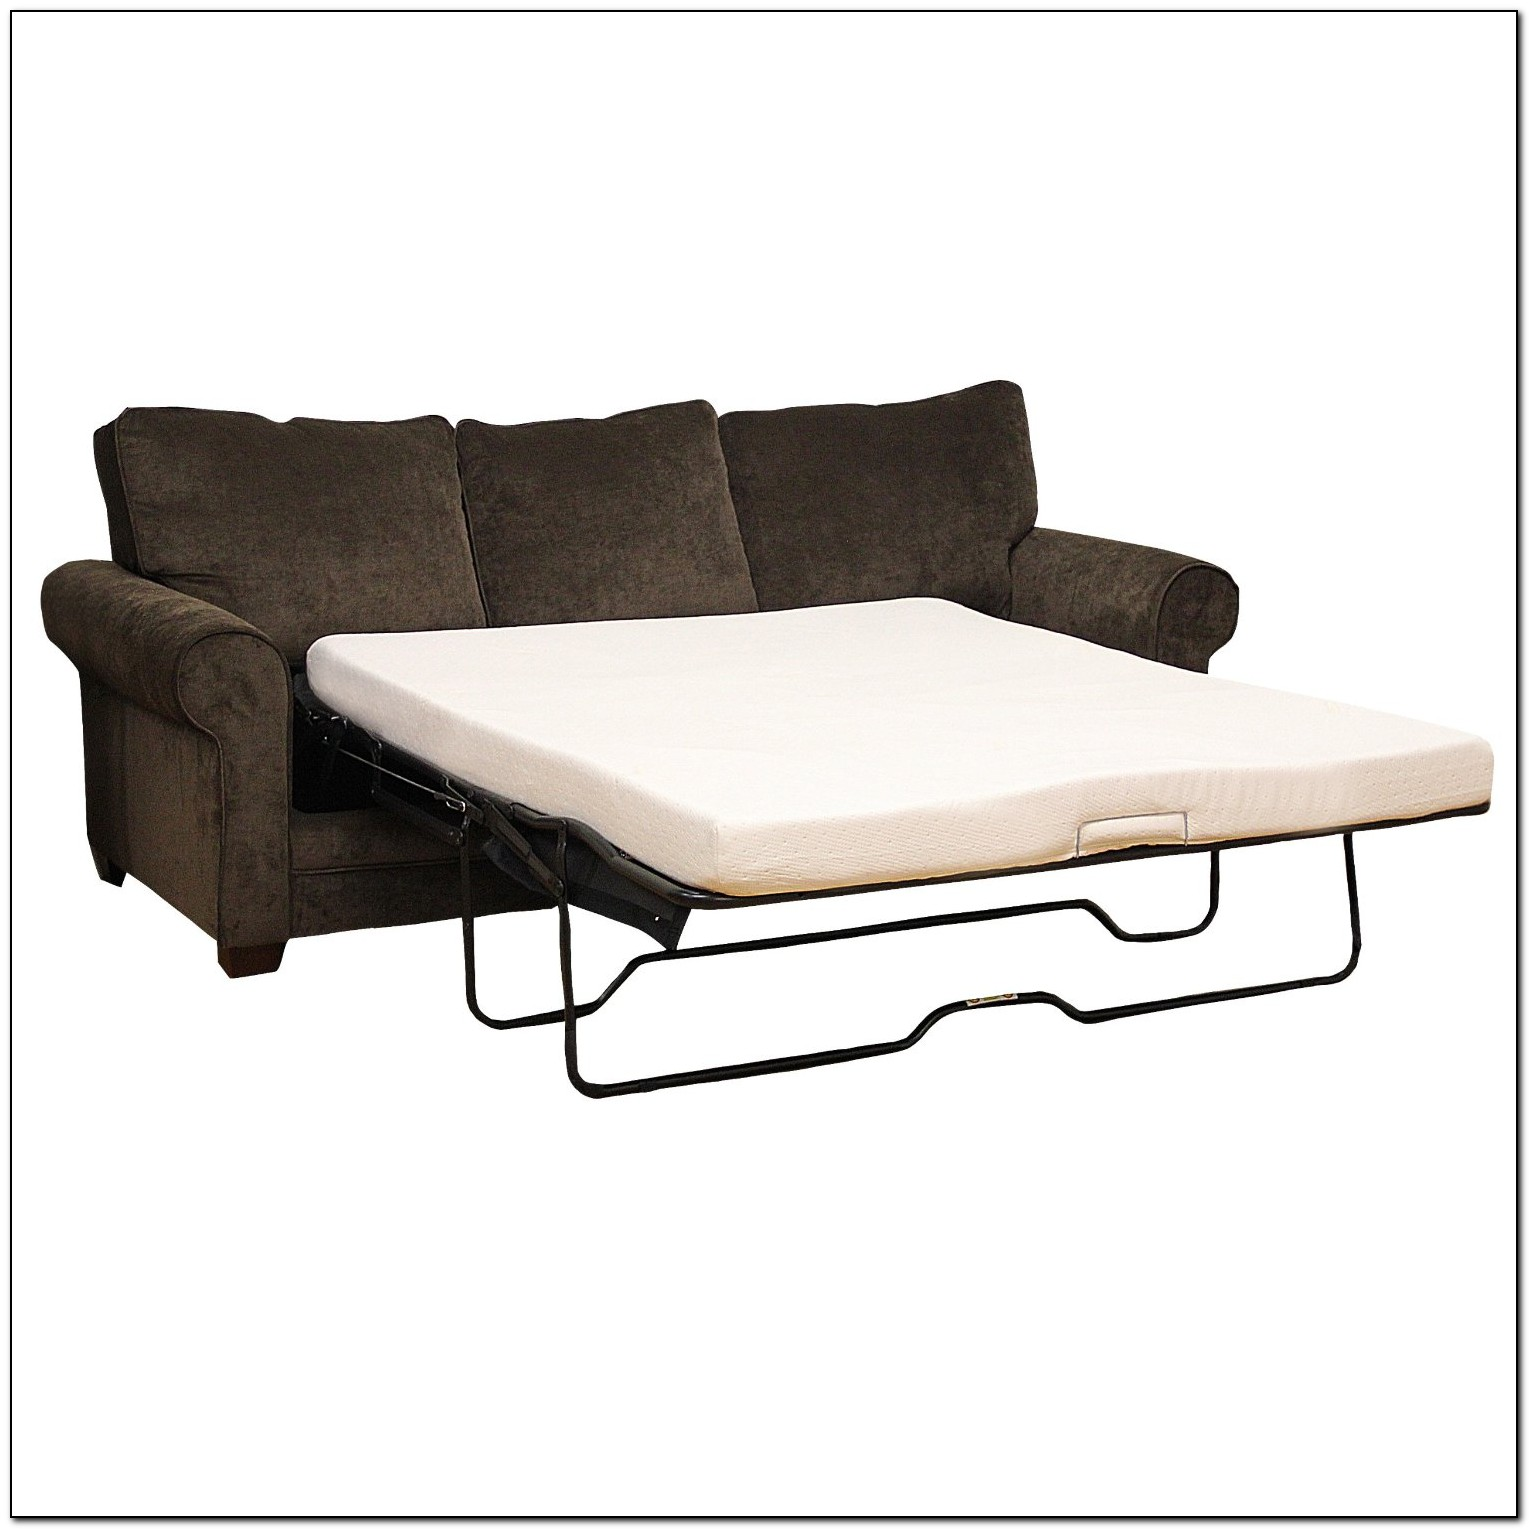 Best Sofa Bed Replacement Mattress